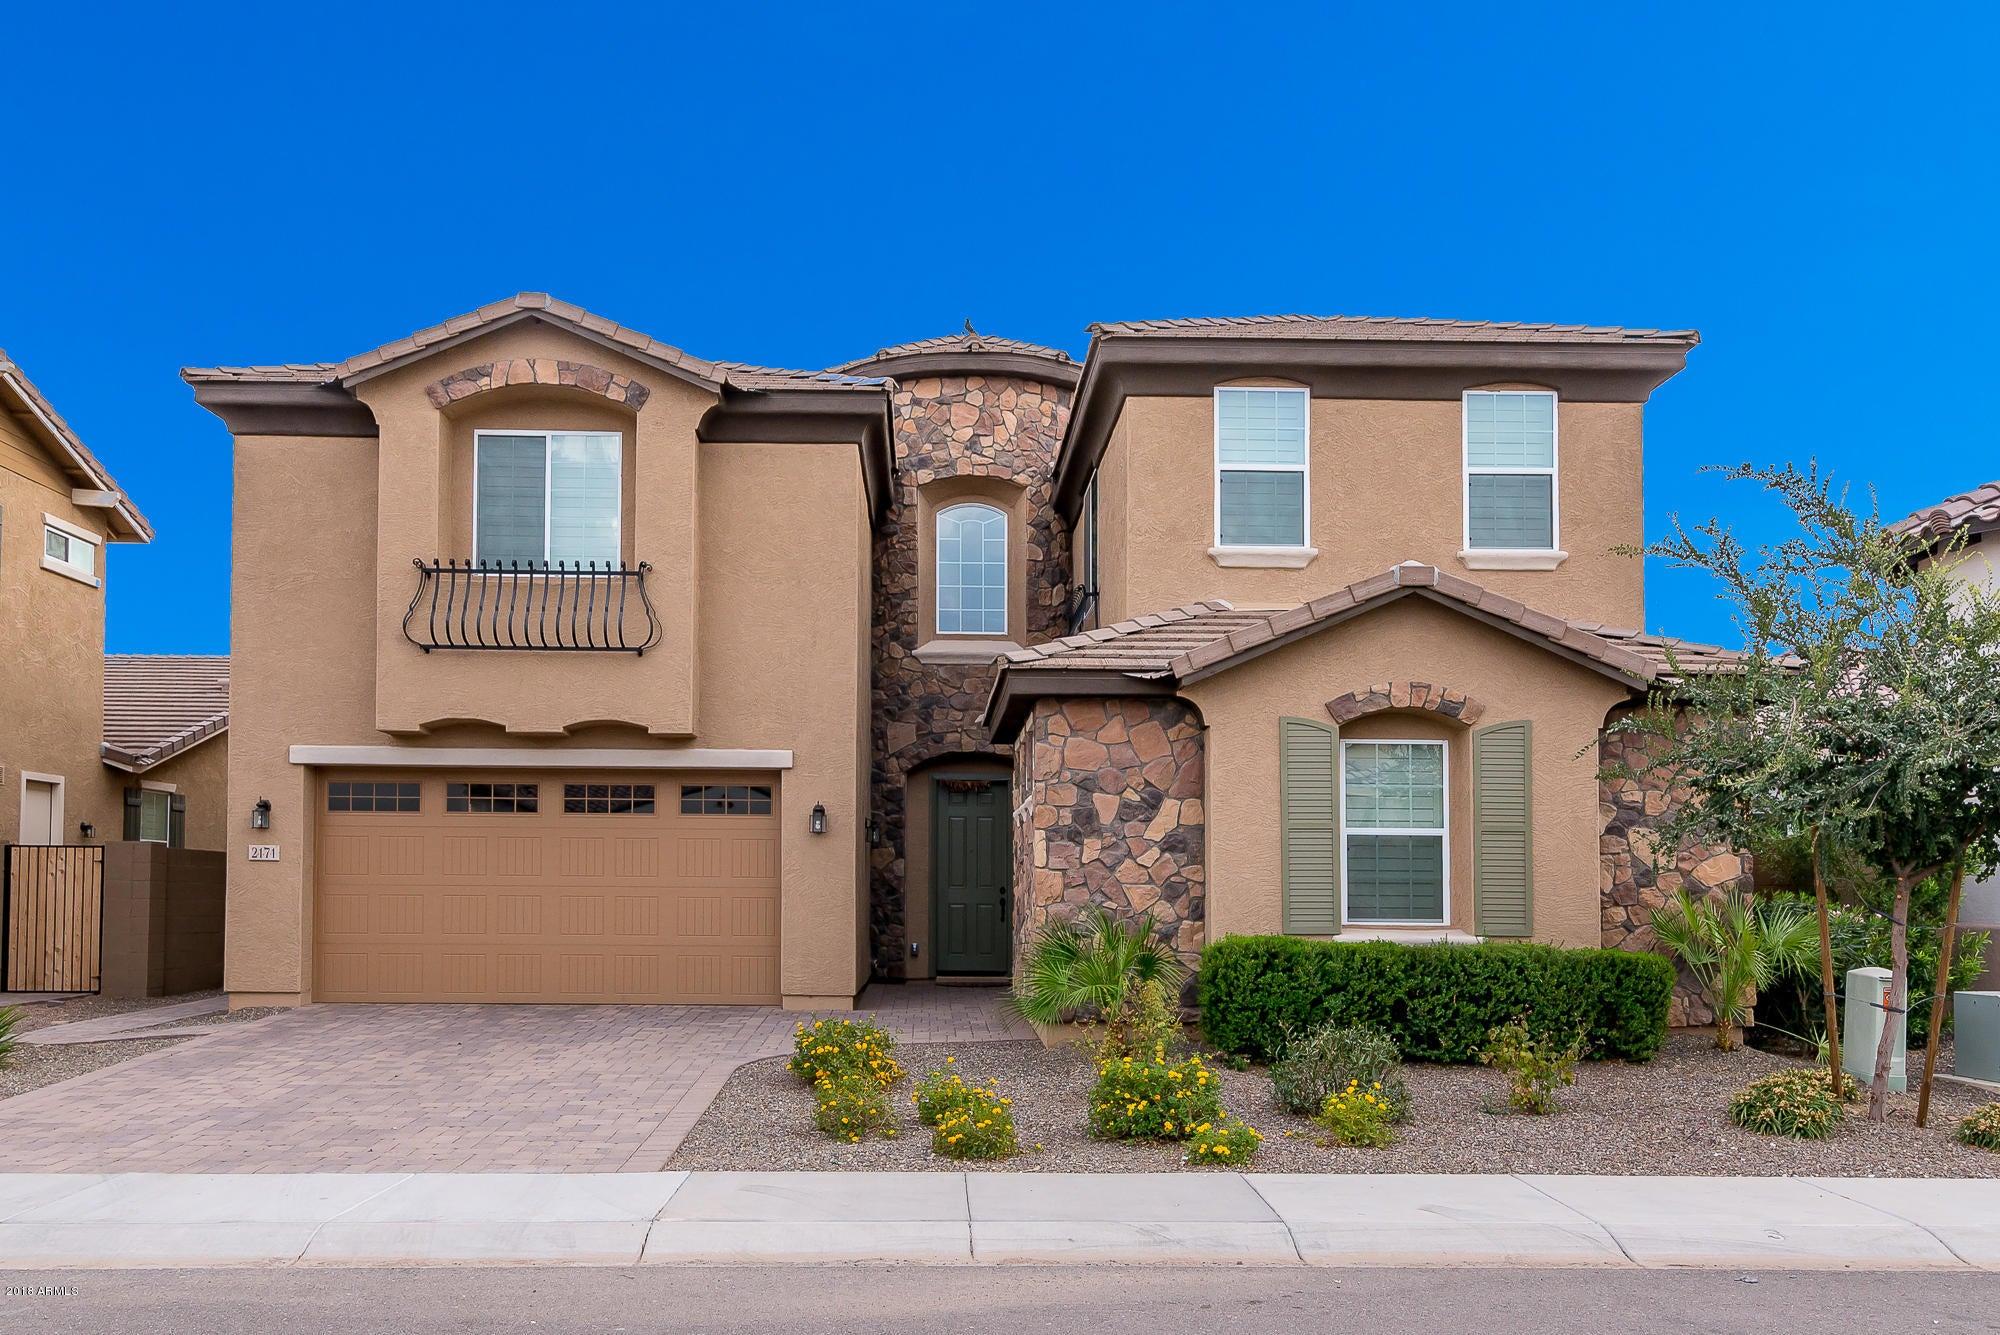 MLS 5811464 2171 E GERONIMO Street, Chandler, AZ 85225 Chandler AZ North Chandler